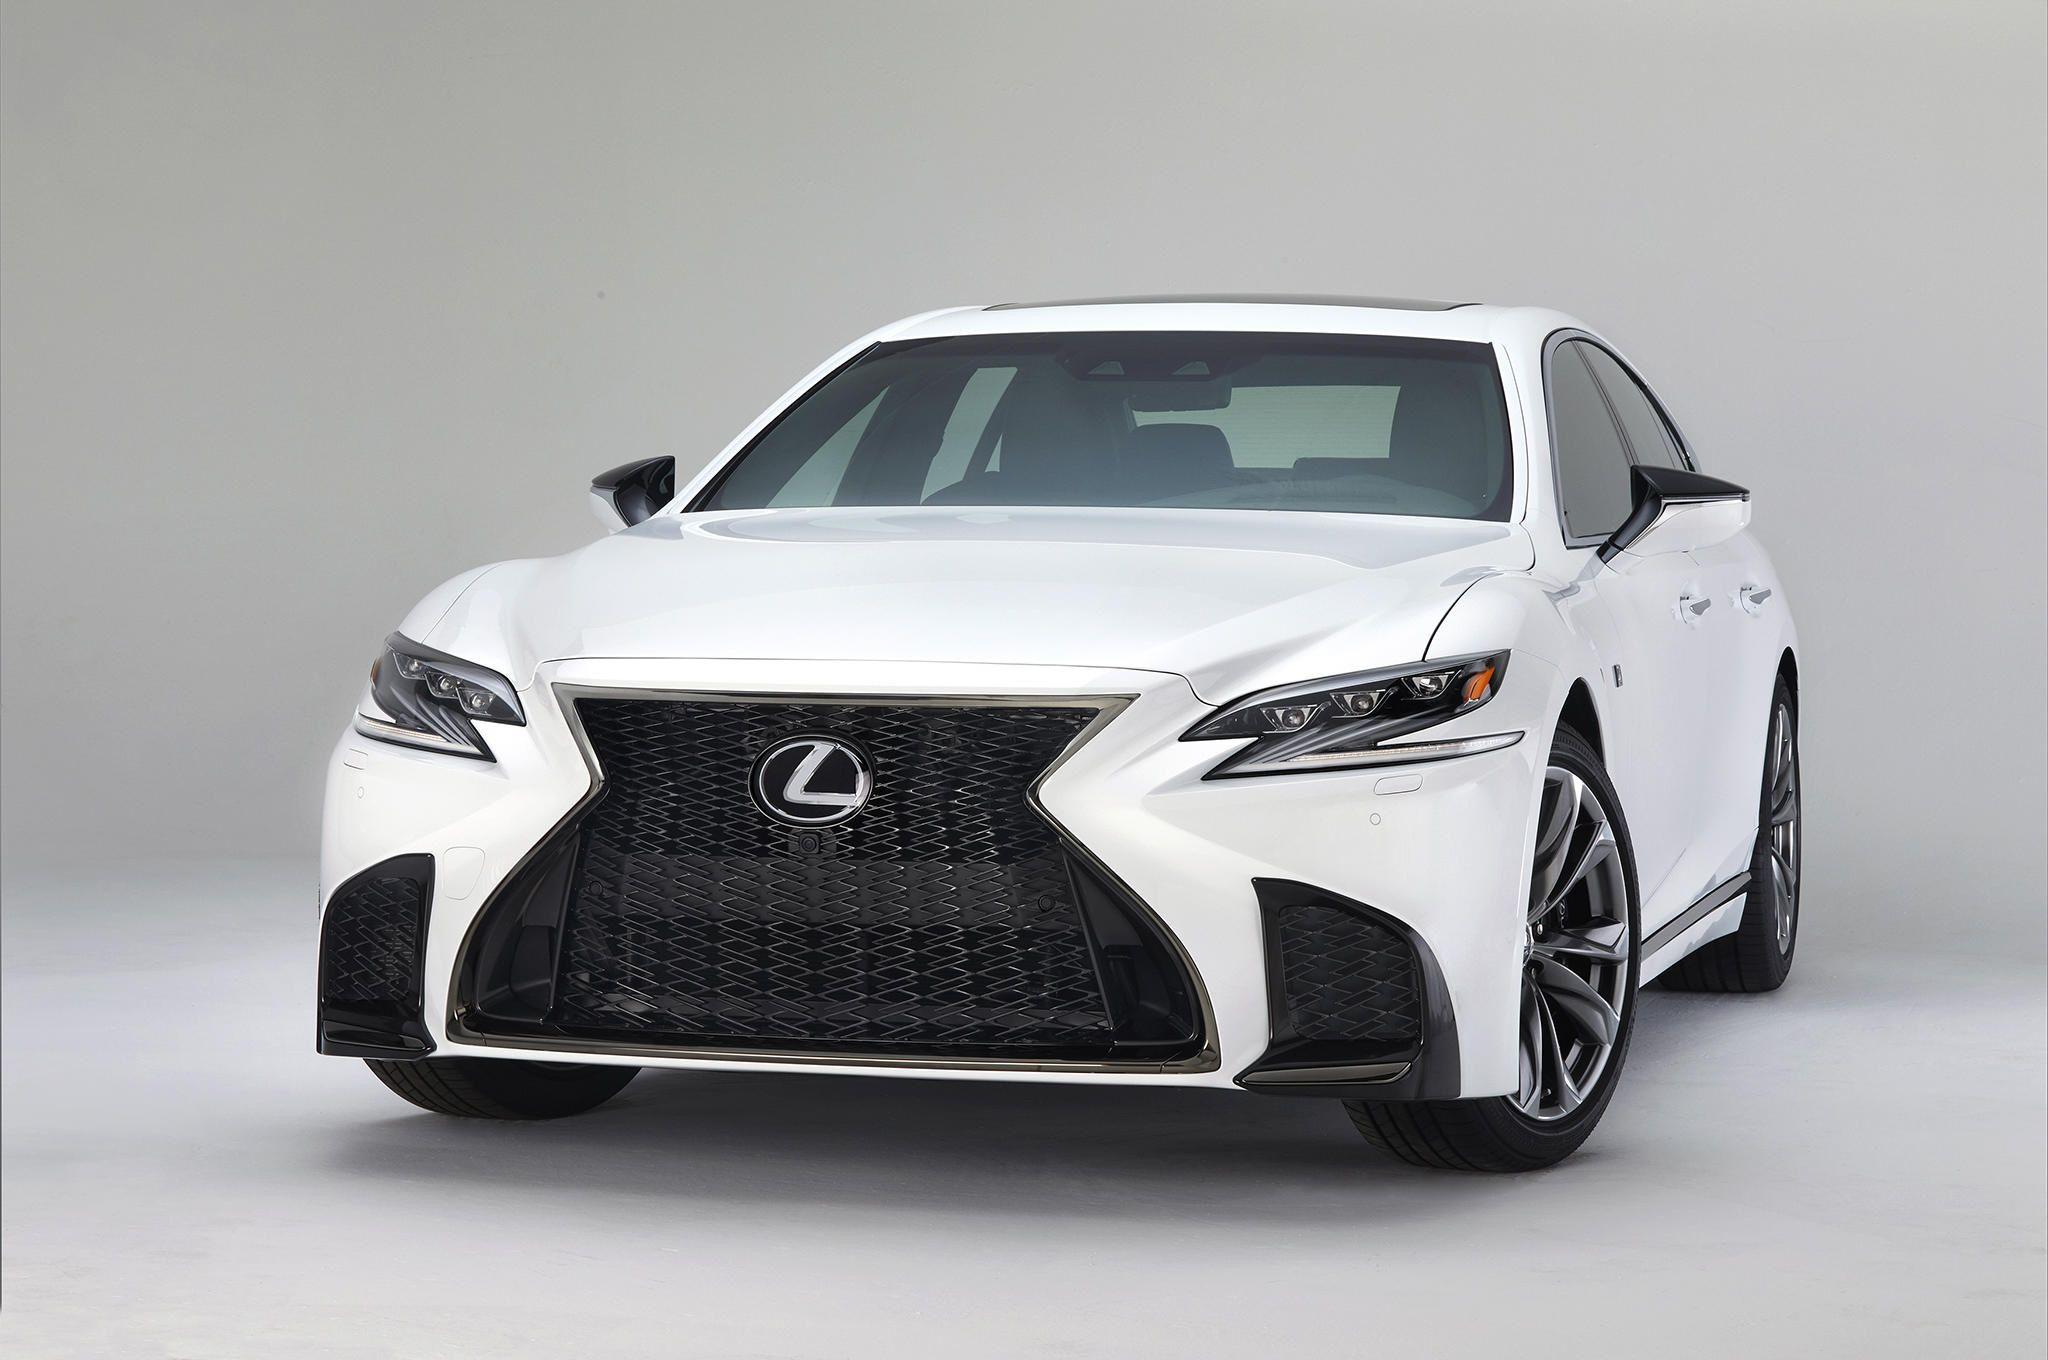 Lexus Unveils F Sport Line For Ls 500 Lexus Ls Lexus Luxury Hybrid Cars 2018 lexus ls 500 f sport